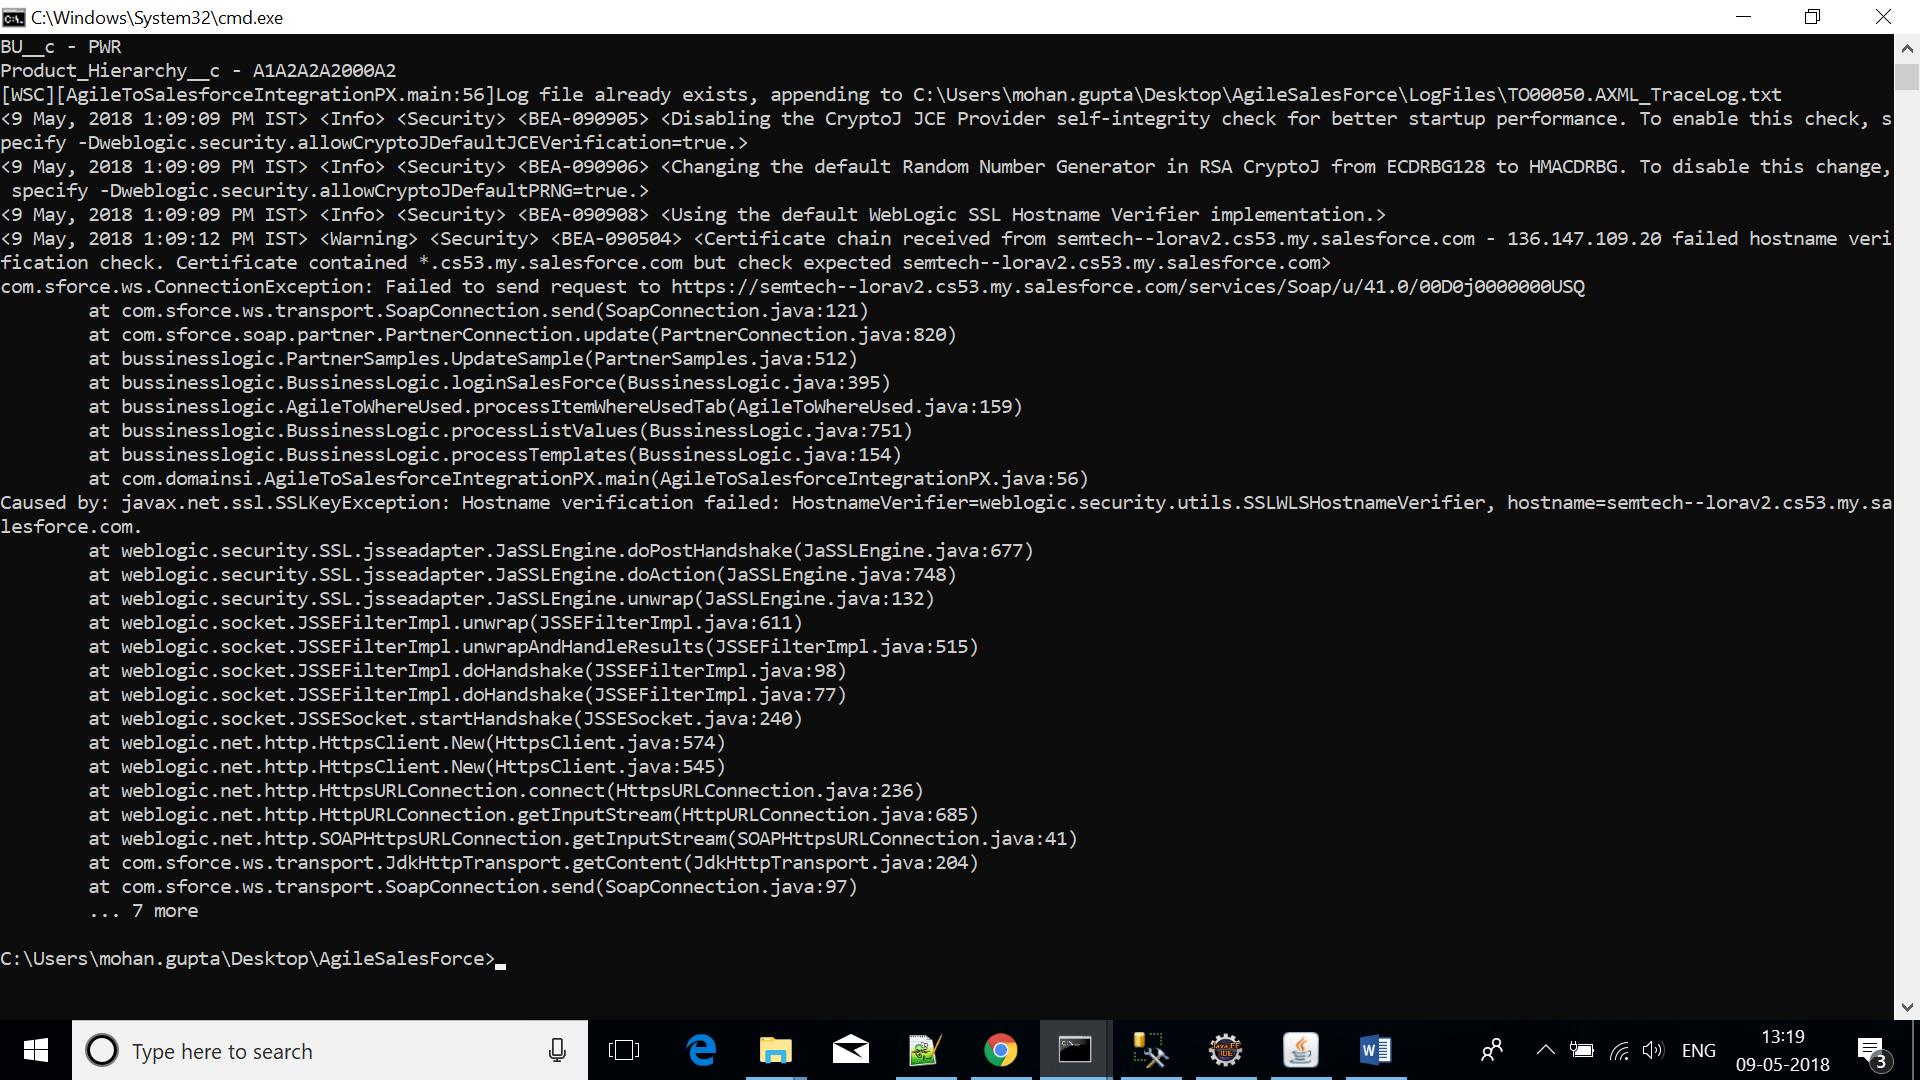 javax.net.ssl.SSLKeyException: Hostname verification failed: HostnameVerifier=weblogic.security.utils.SSLWLSHostnameVerifier, hostname=semtech--lorav2.cs53.my.salesforce.com.